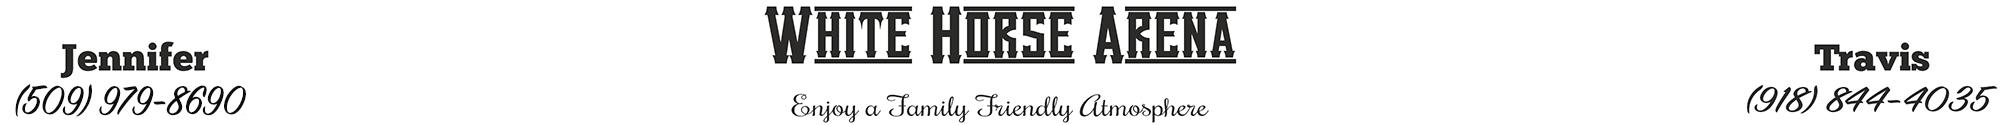 White-Horse-Arena-Banner-